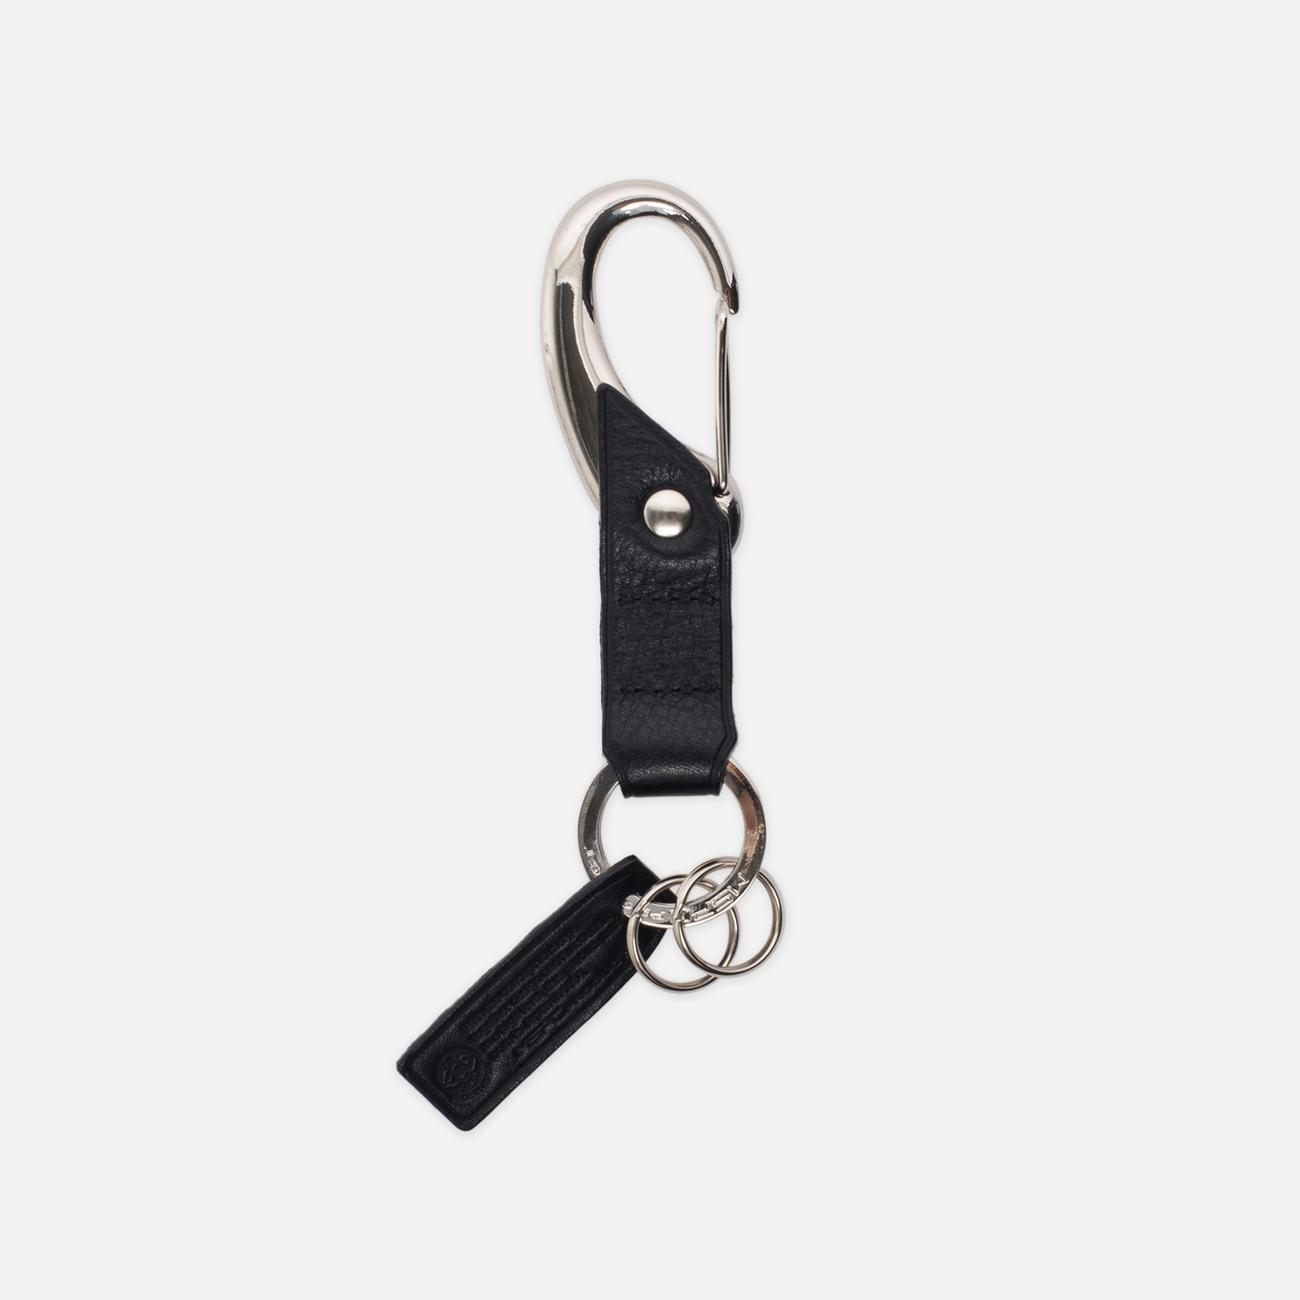 Ключница Master-piece Leather Bos Taurus Black